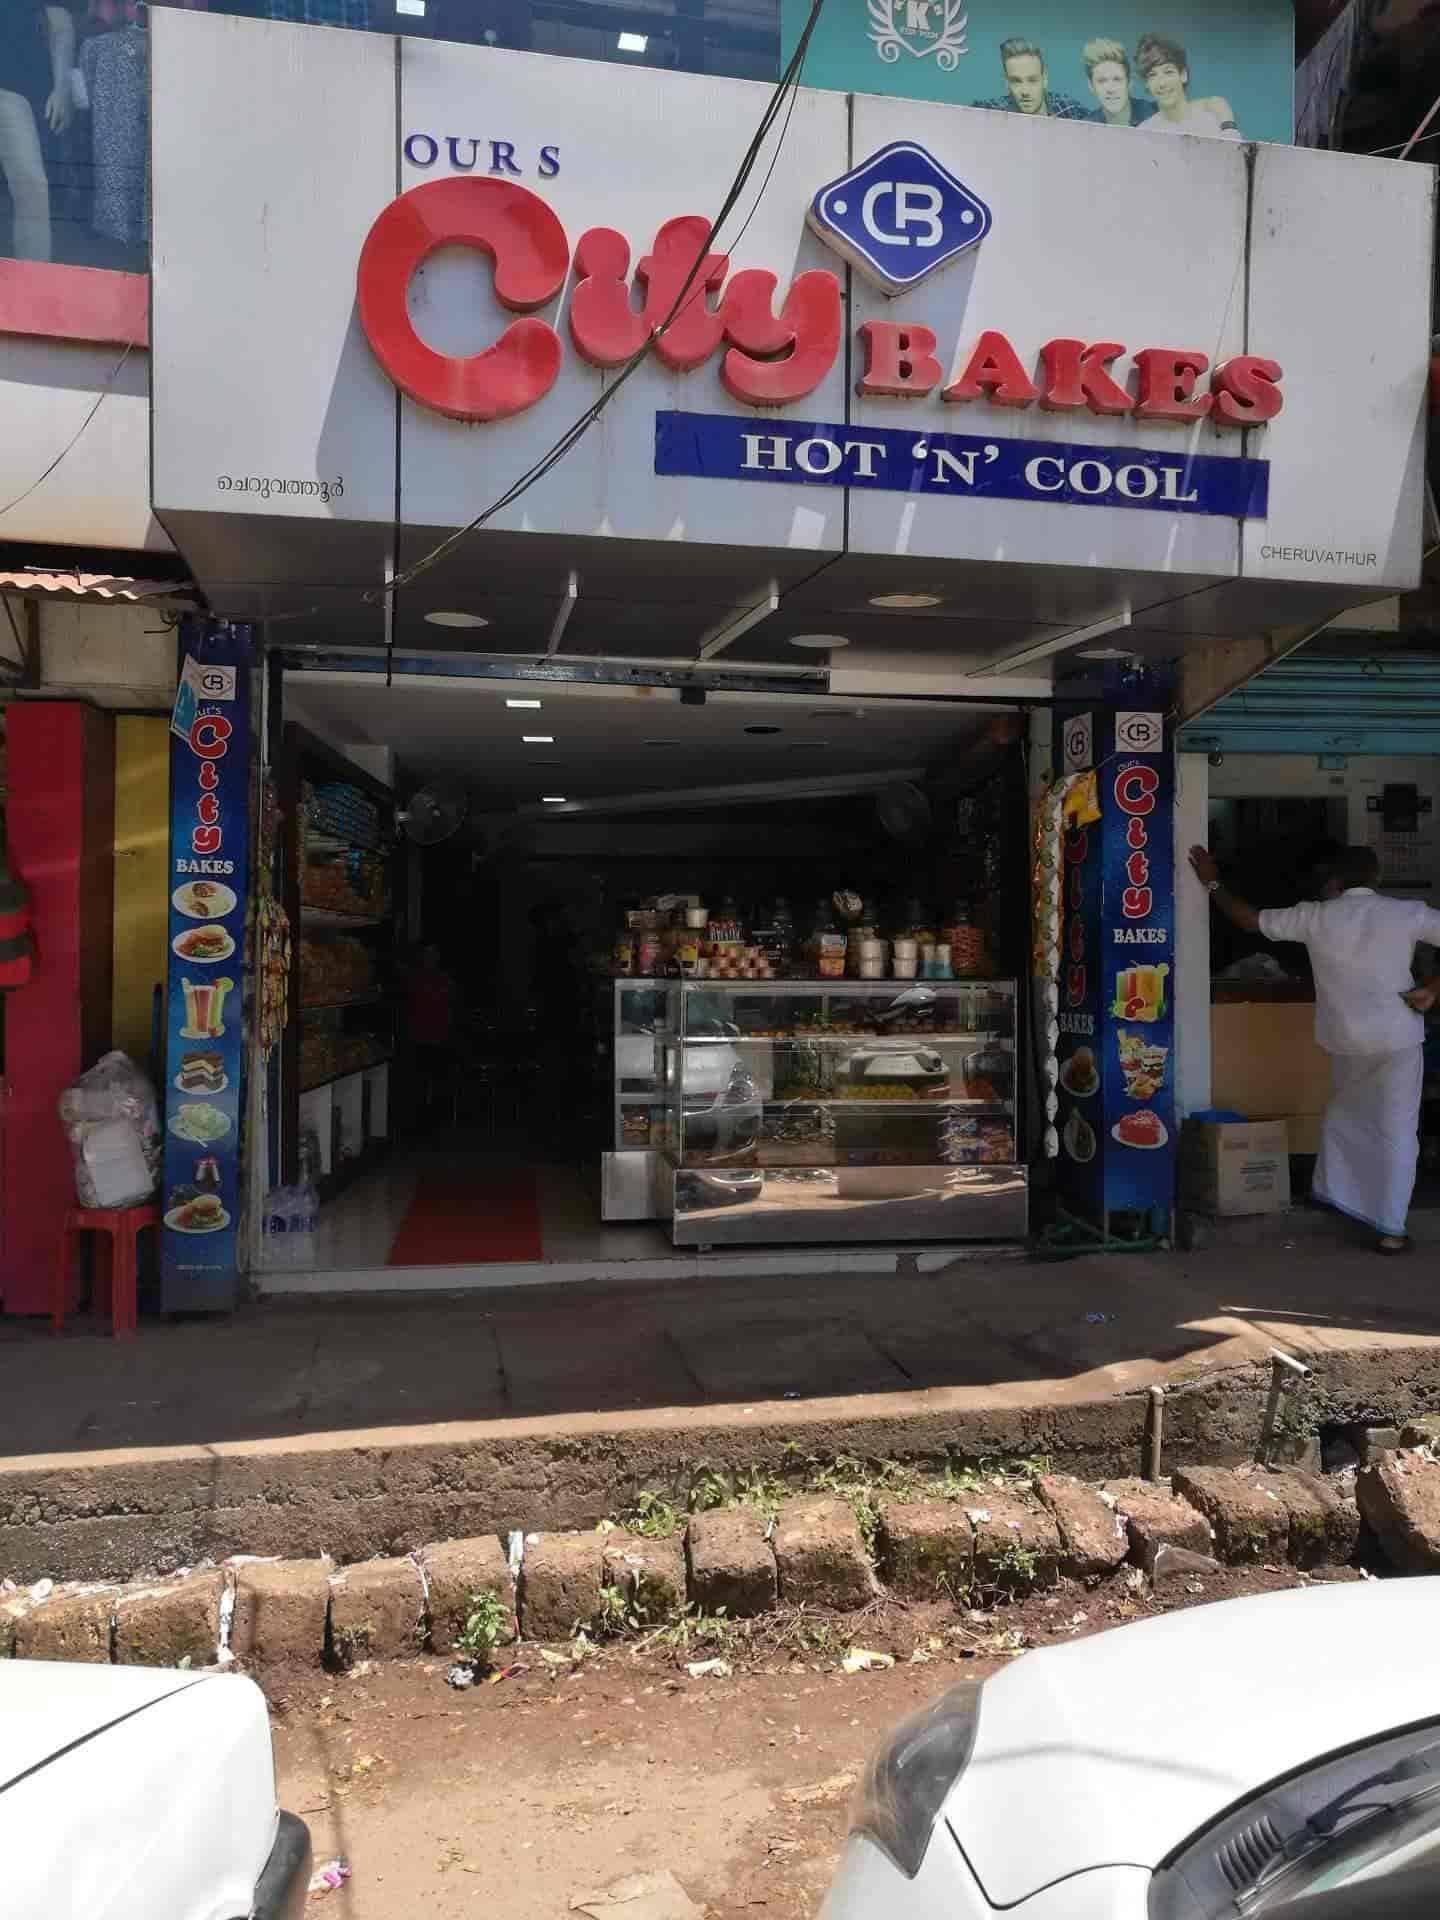 Sweet Shops in Nileshwar, Kasaragod - Sweets Stores - Justdial